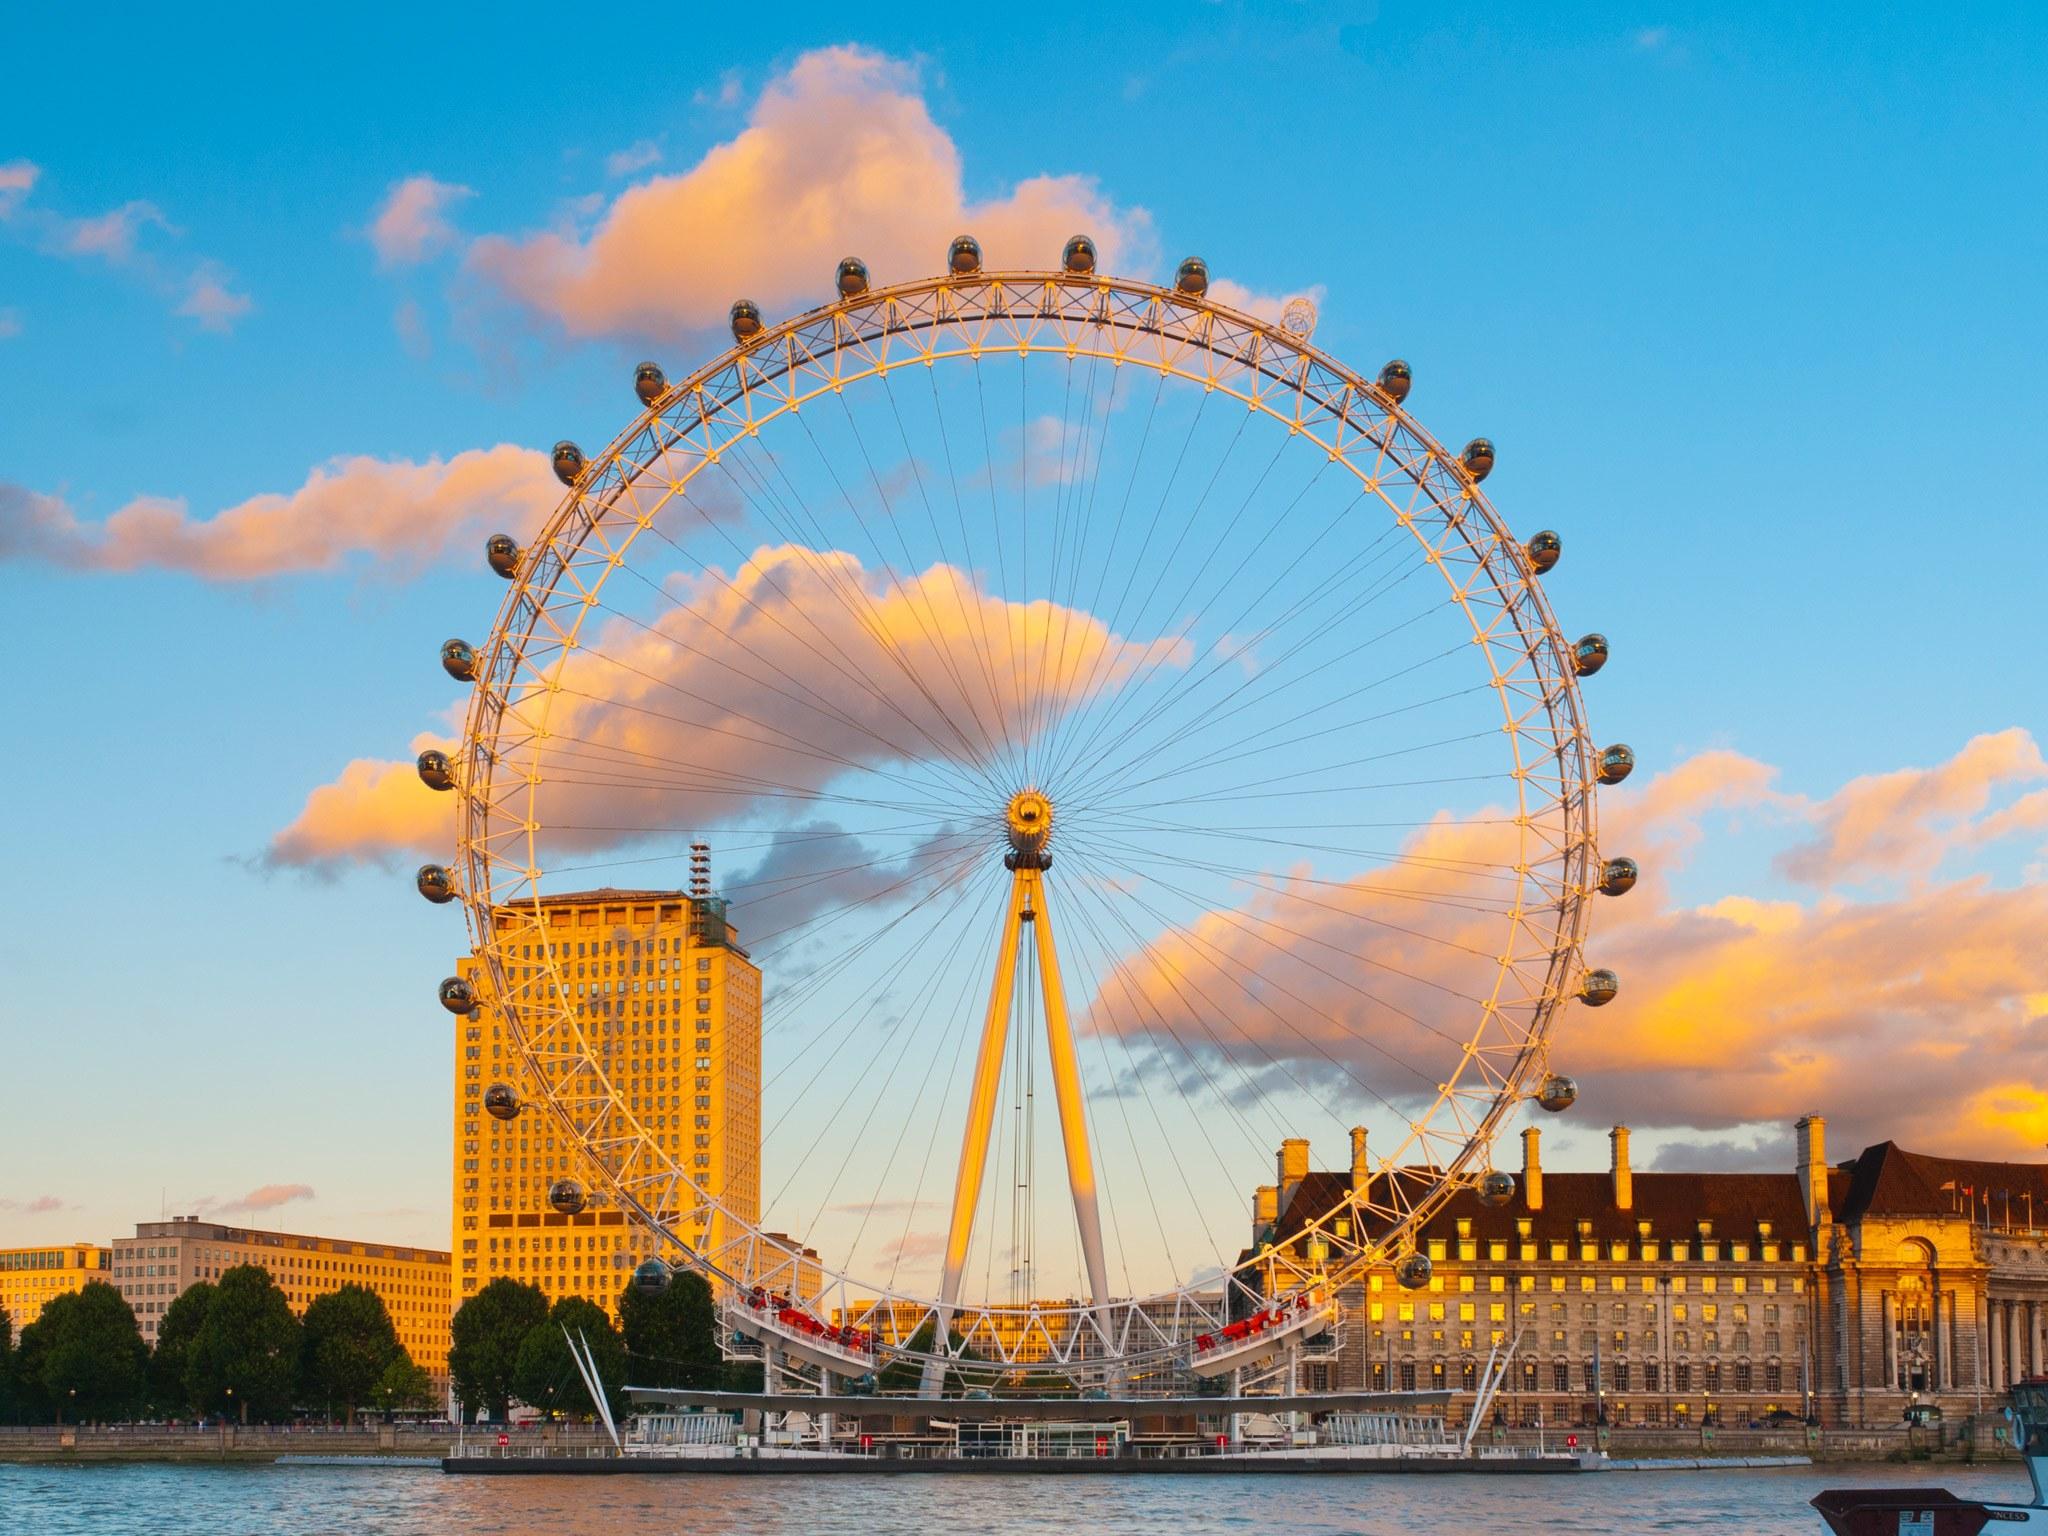 Amazing Wallpaper Home Screen London - london-eyes  You Should Have_696879.jpg